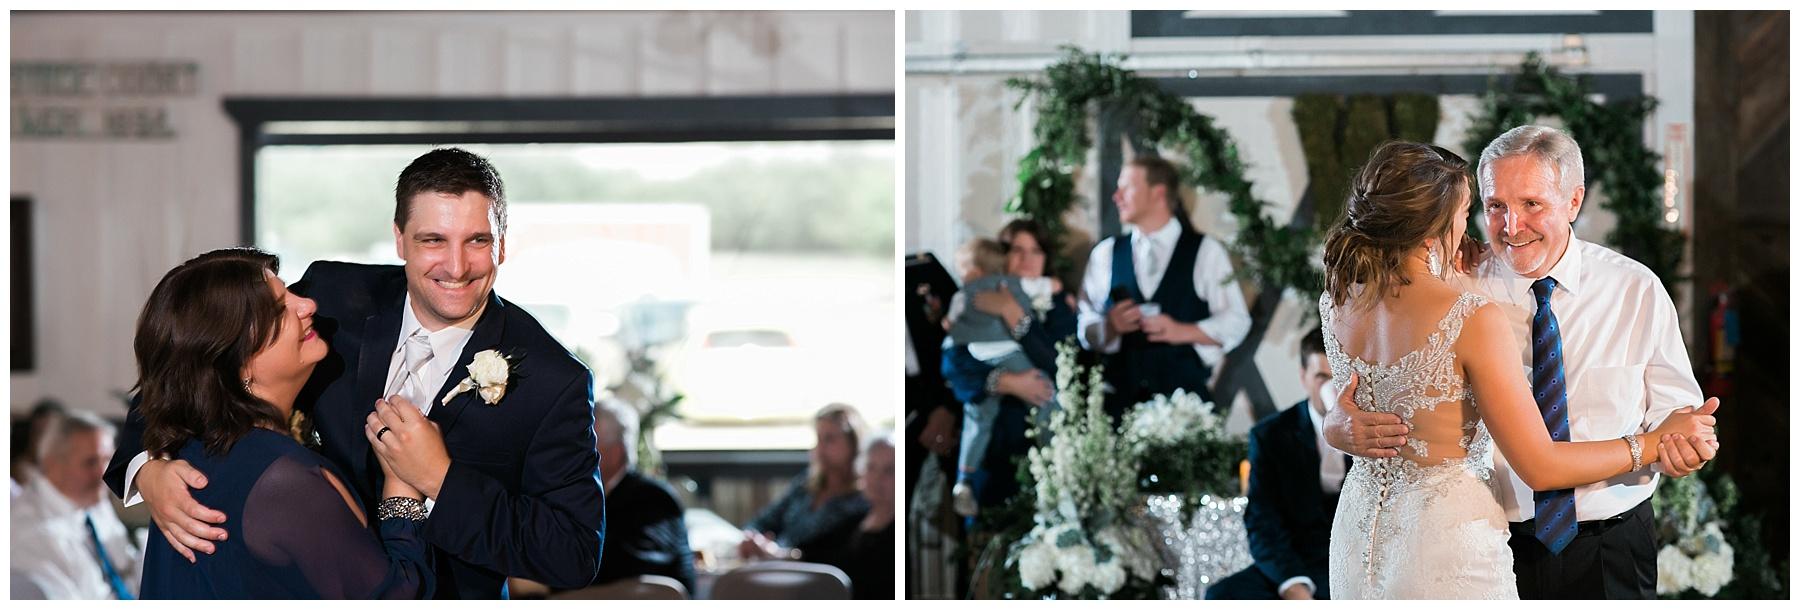 sacred-heart-catholic-church-muenster-tx-the-veranda-in-nocona-tx-wichita-falls-wedding-photographer-00038.jpg